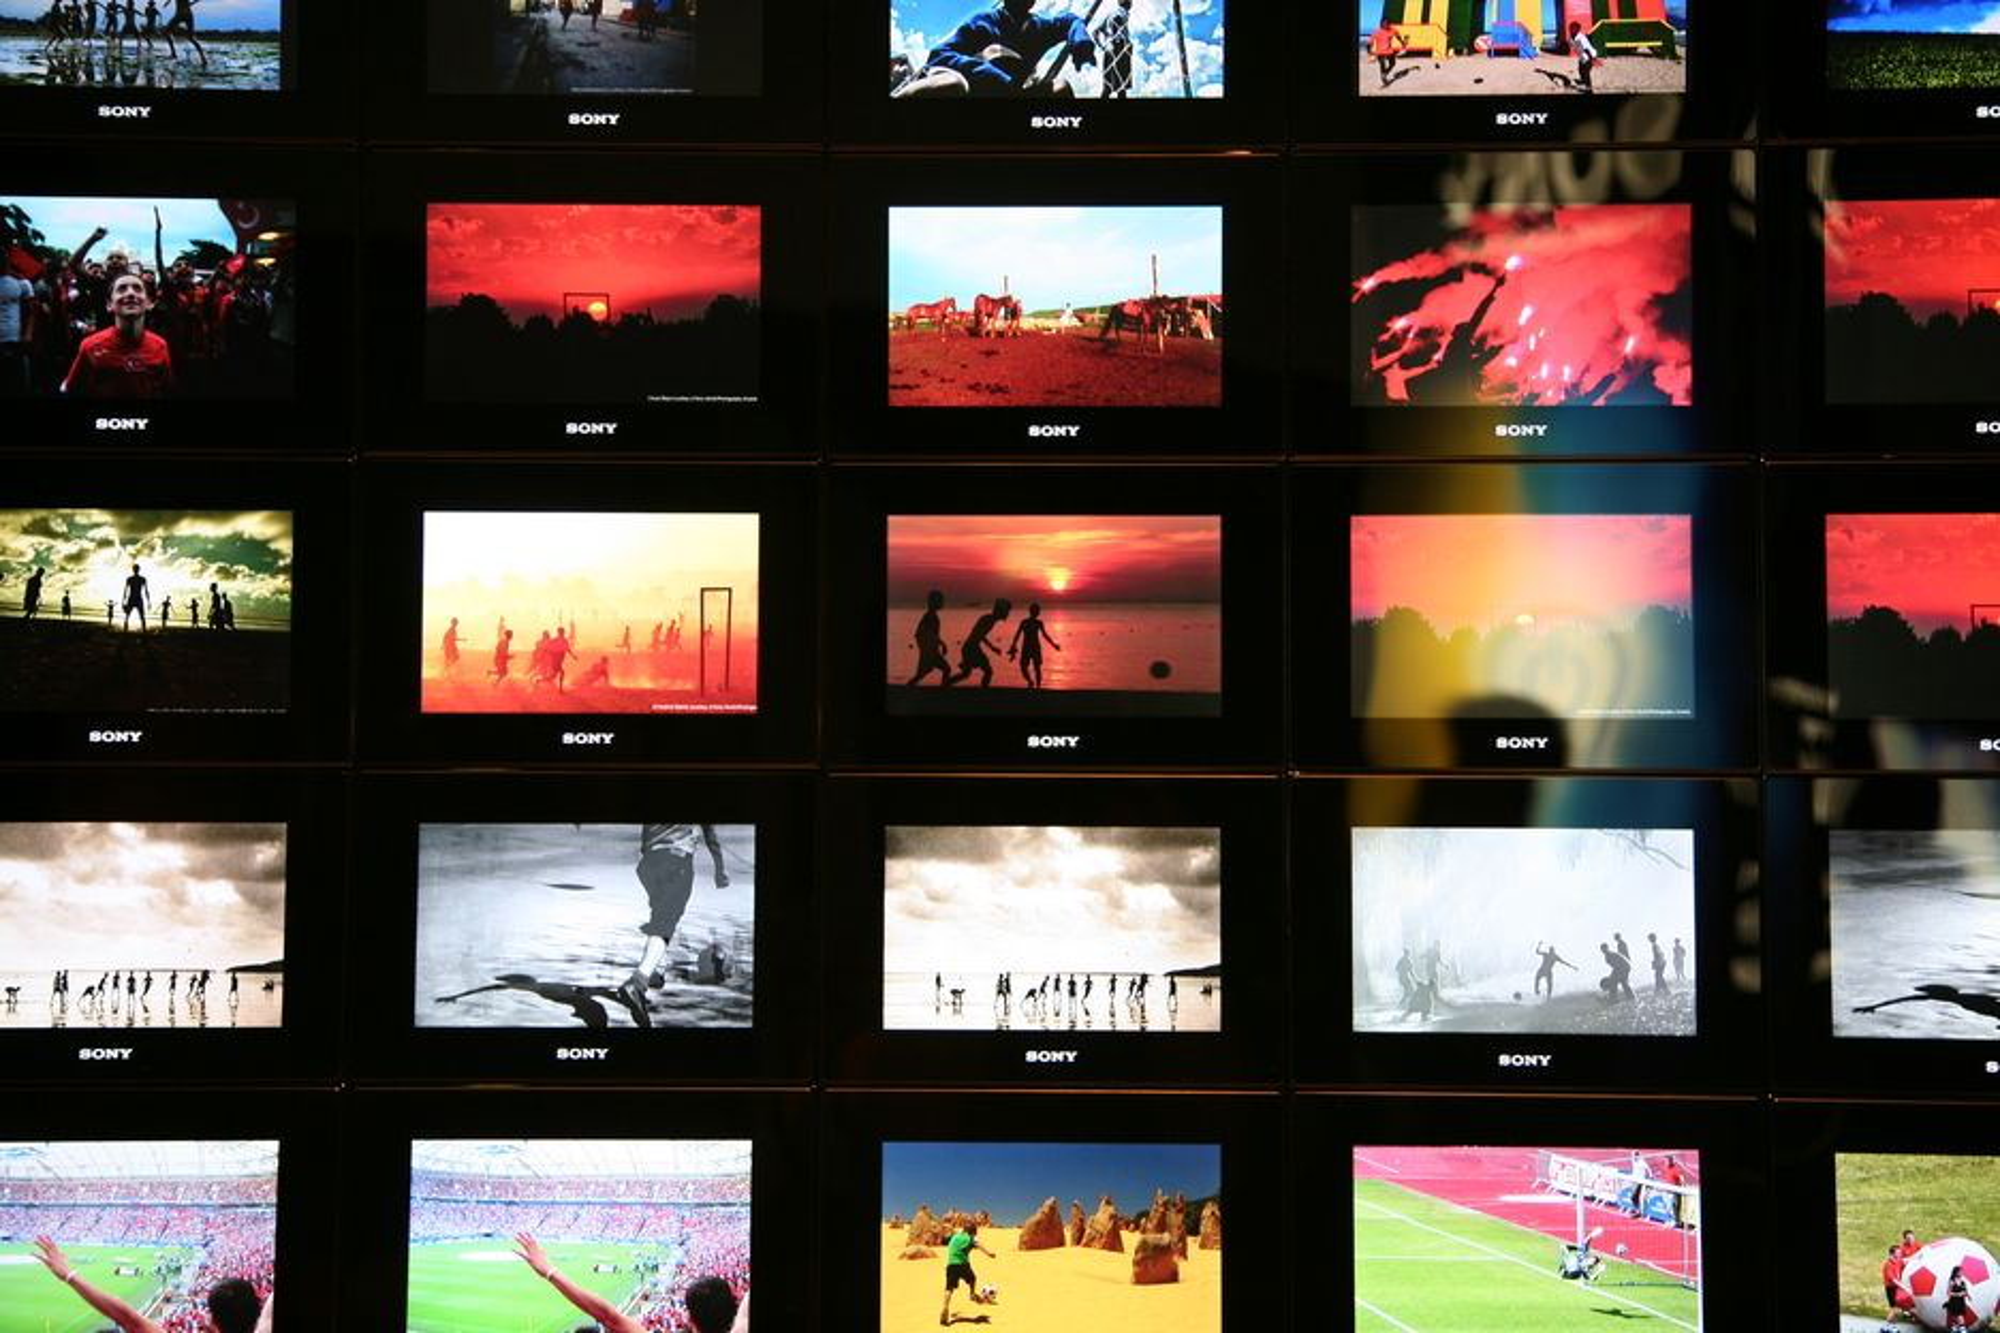 TEST: Er 3D-TV en gimmick eller ikke? Det er spørsmålet.